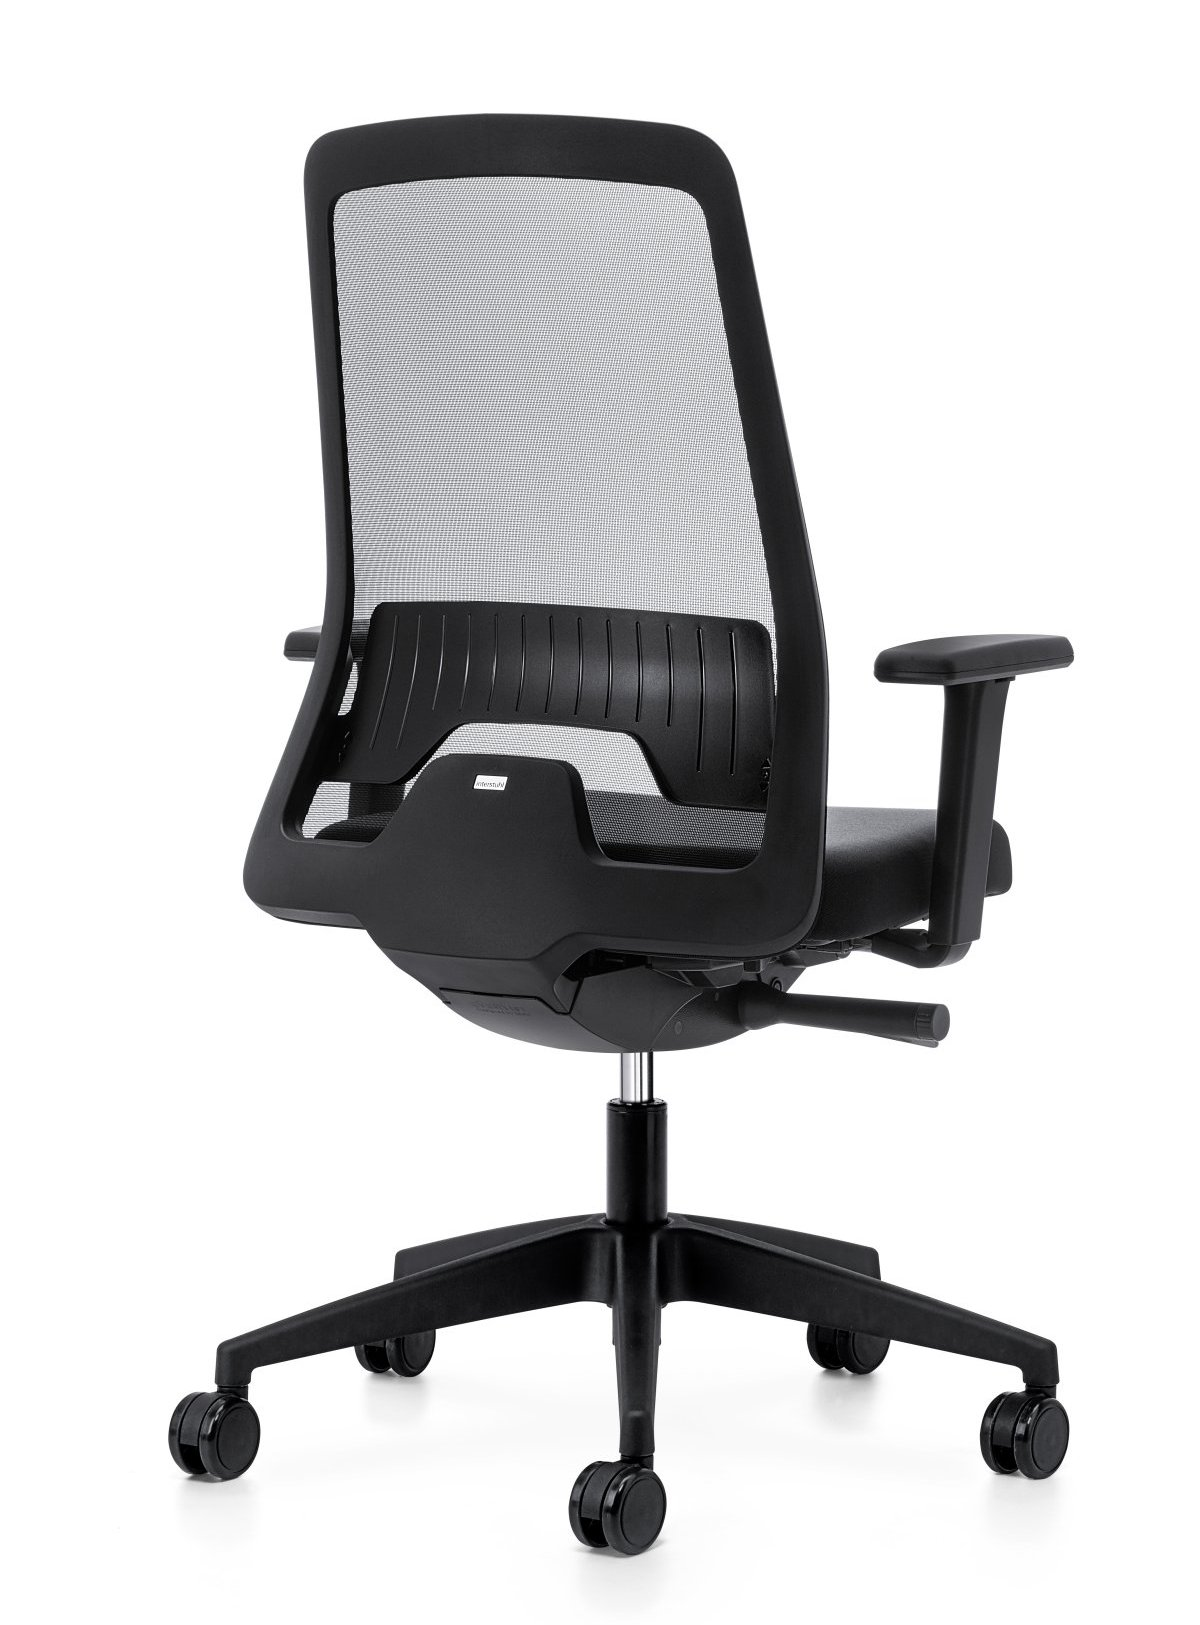 EVERY 172E Series Task Chair by Interstuhl : ErgoCanada